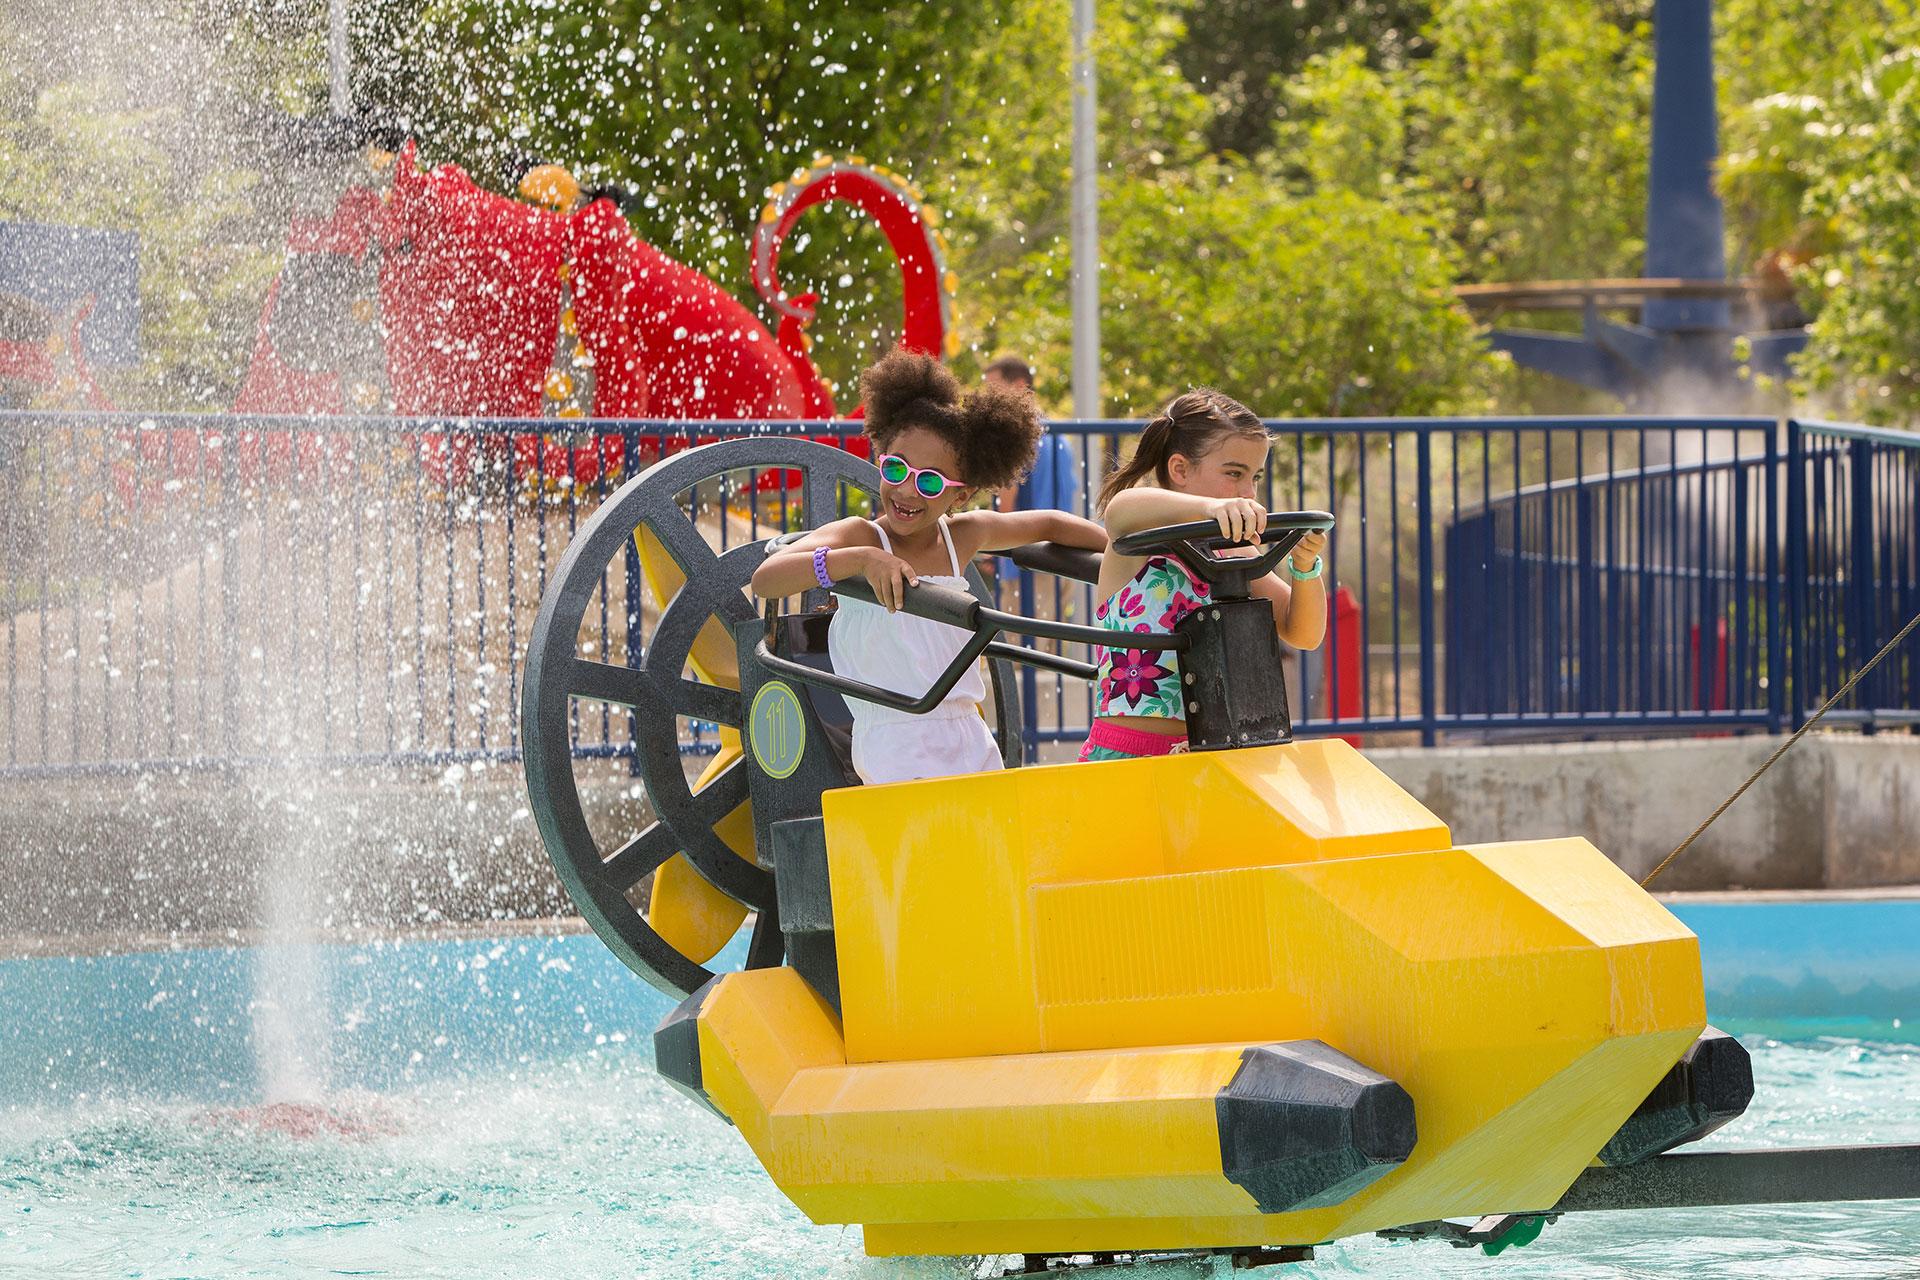 Water Fun at LEGOLAND Florida Resort; Courtesy of LEGOLAND Florida Resort